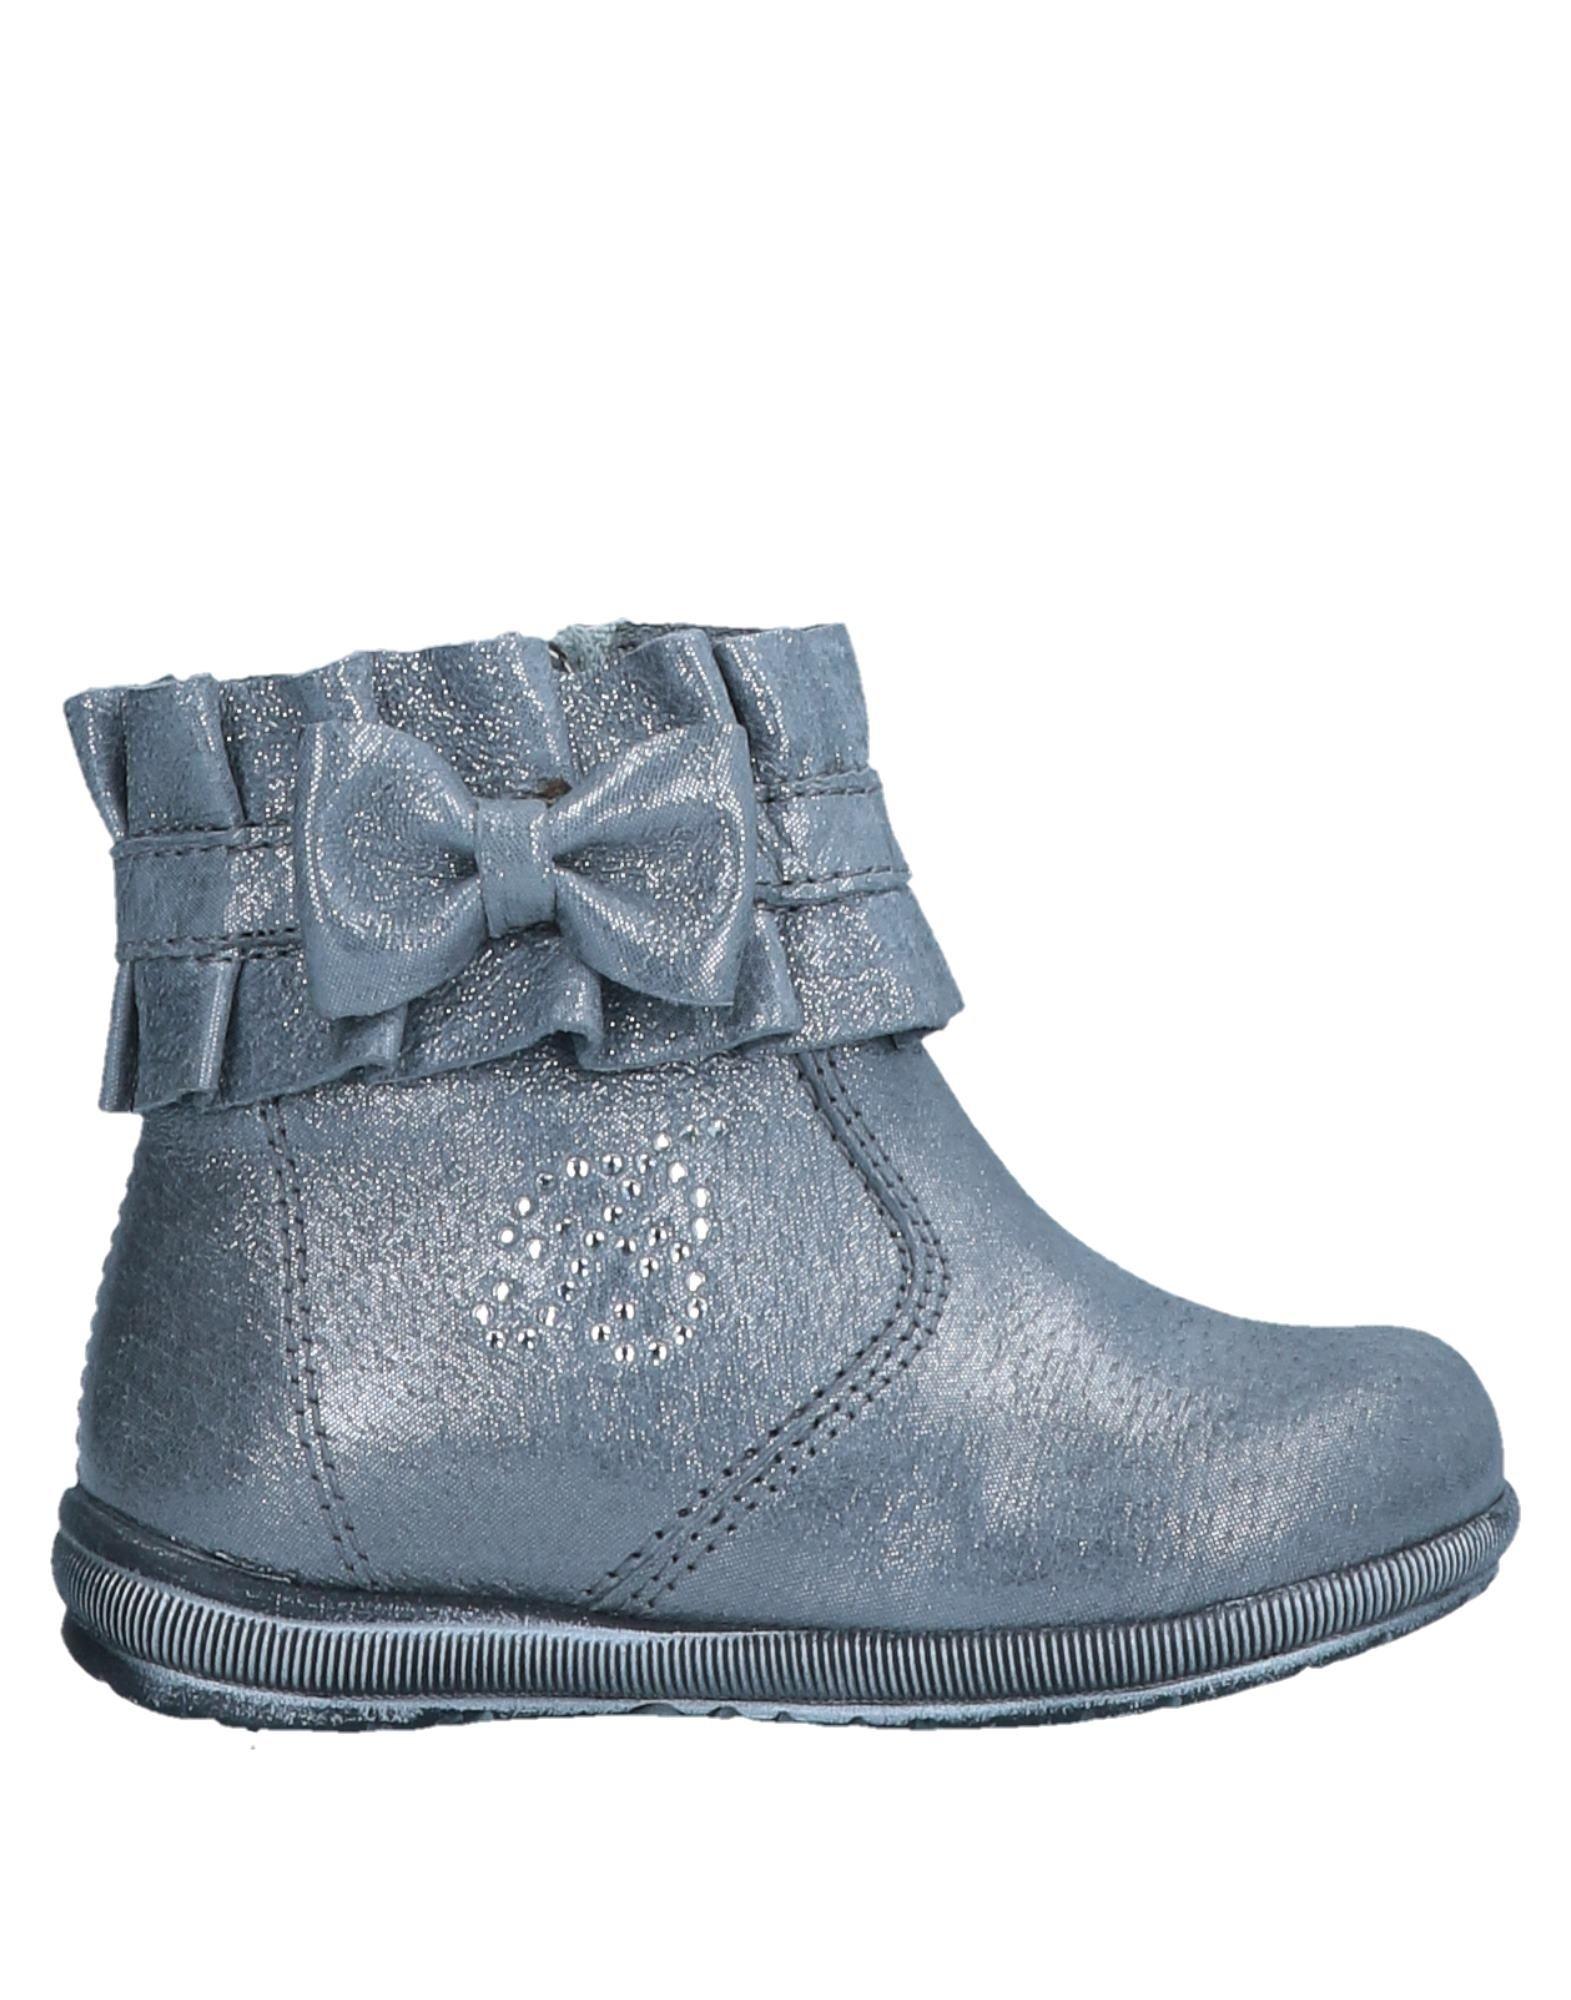 MISS BLUMARINE Полусапоги и высокие ботинки miss unique полусапоги и высокие ботинки